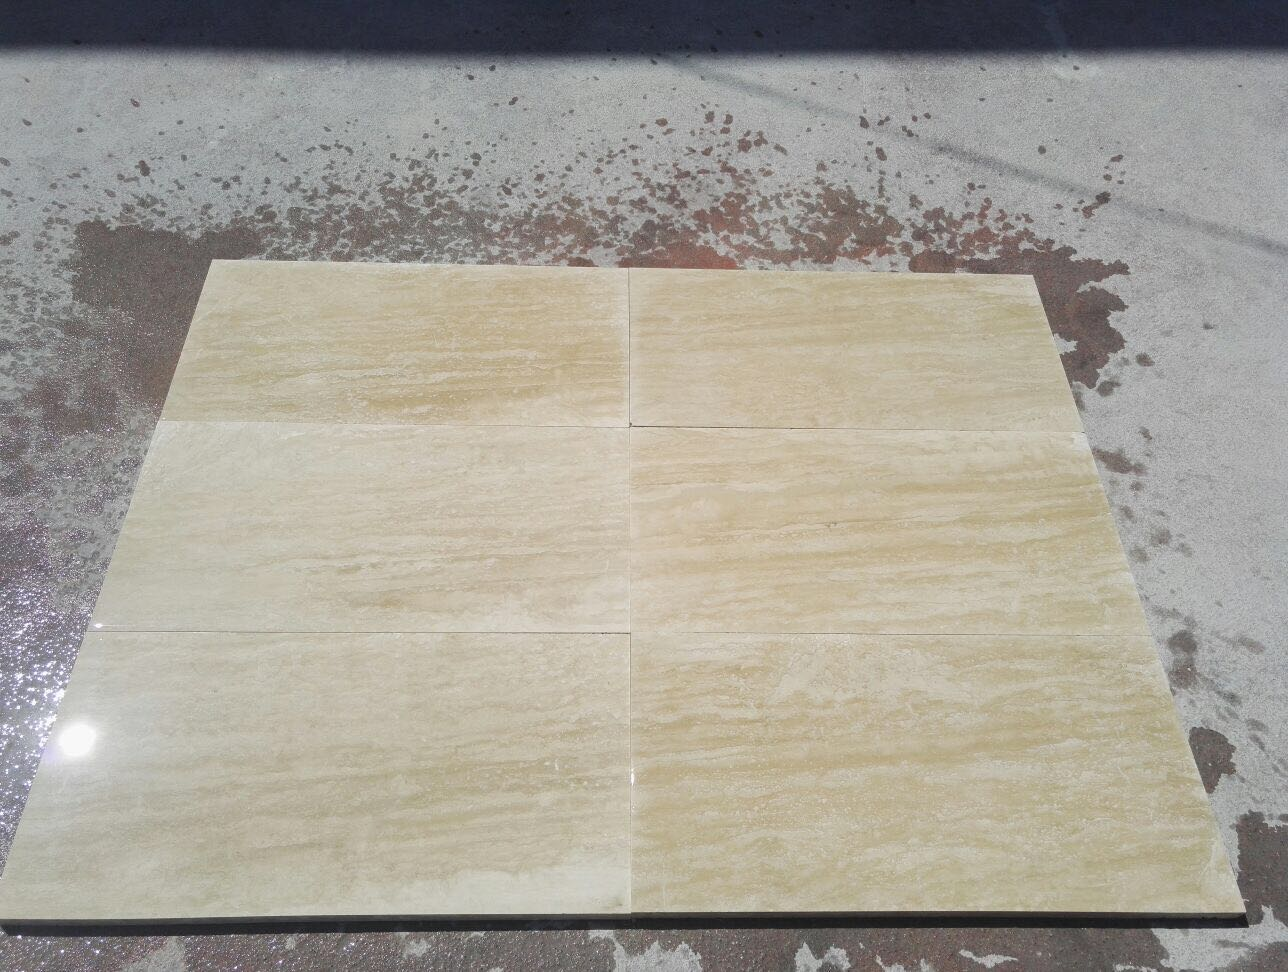 Light Travertine Veincut Filled Honed 40x80x2 cm Tiles - Premium   Mazzmar  Stone